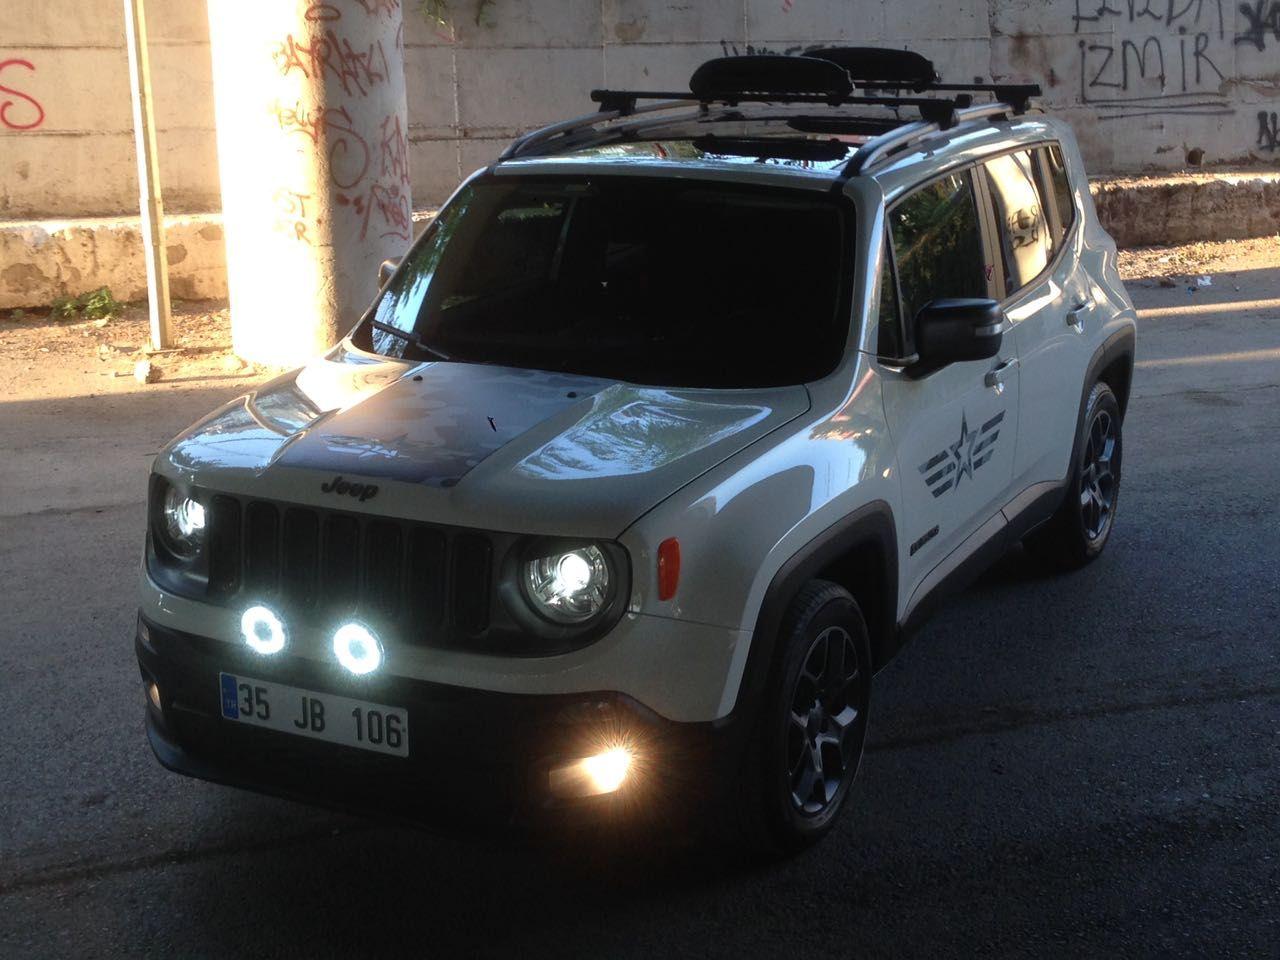 Jeep Renegade Jeep Renegade Jeep Renegade Trailhawk Jeep